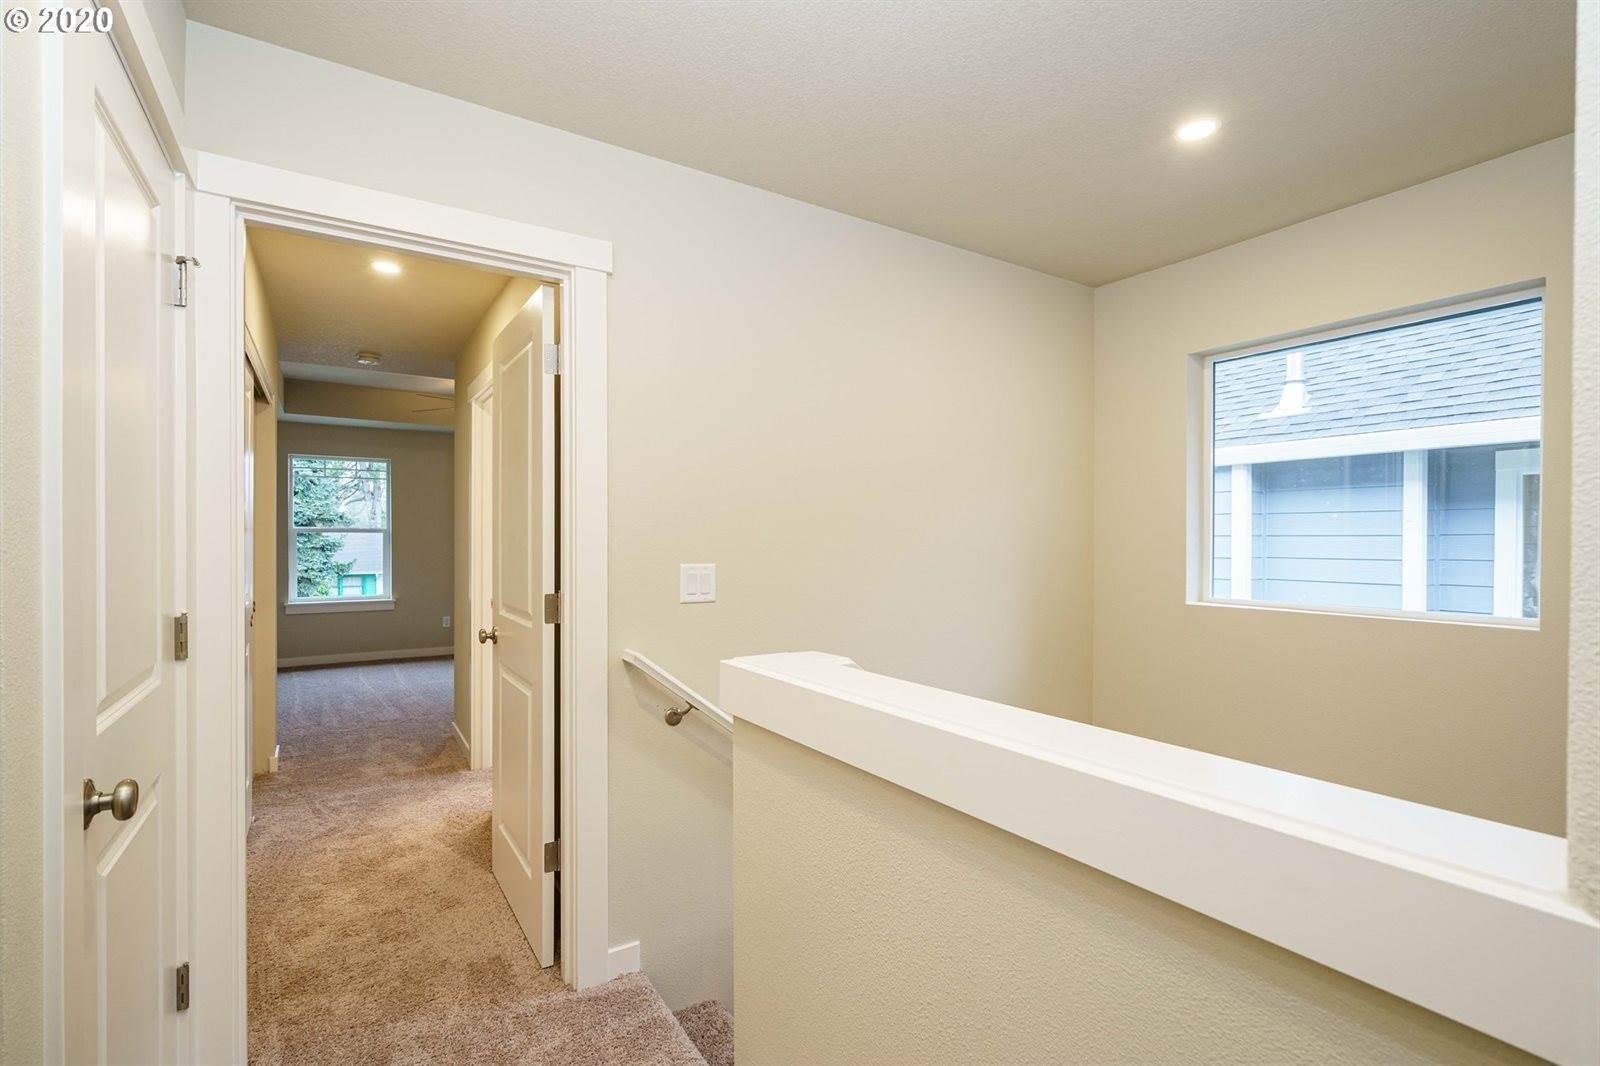 1690 NE 80 Ave, Portland, OR 97213